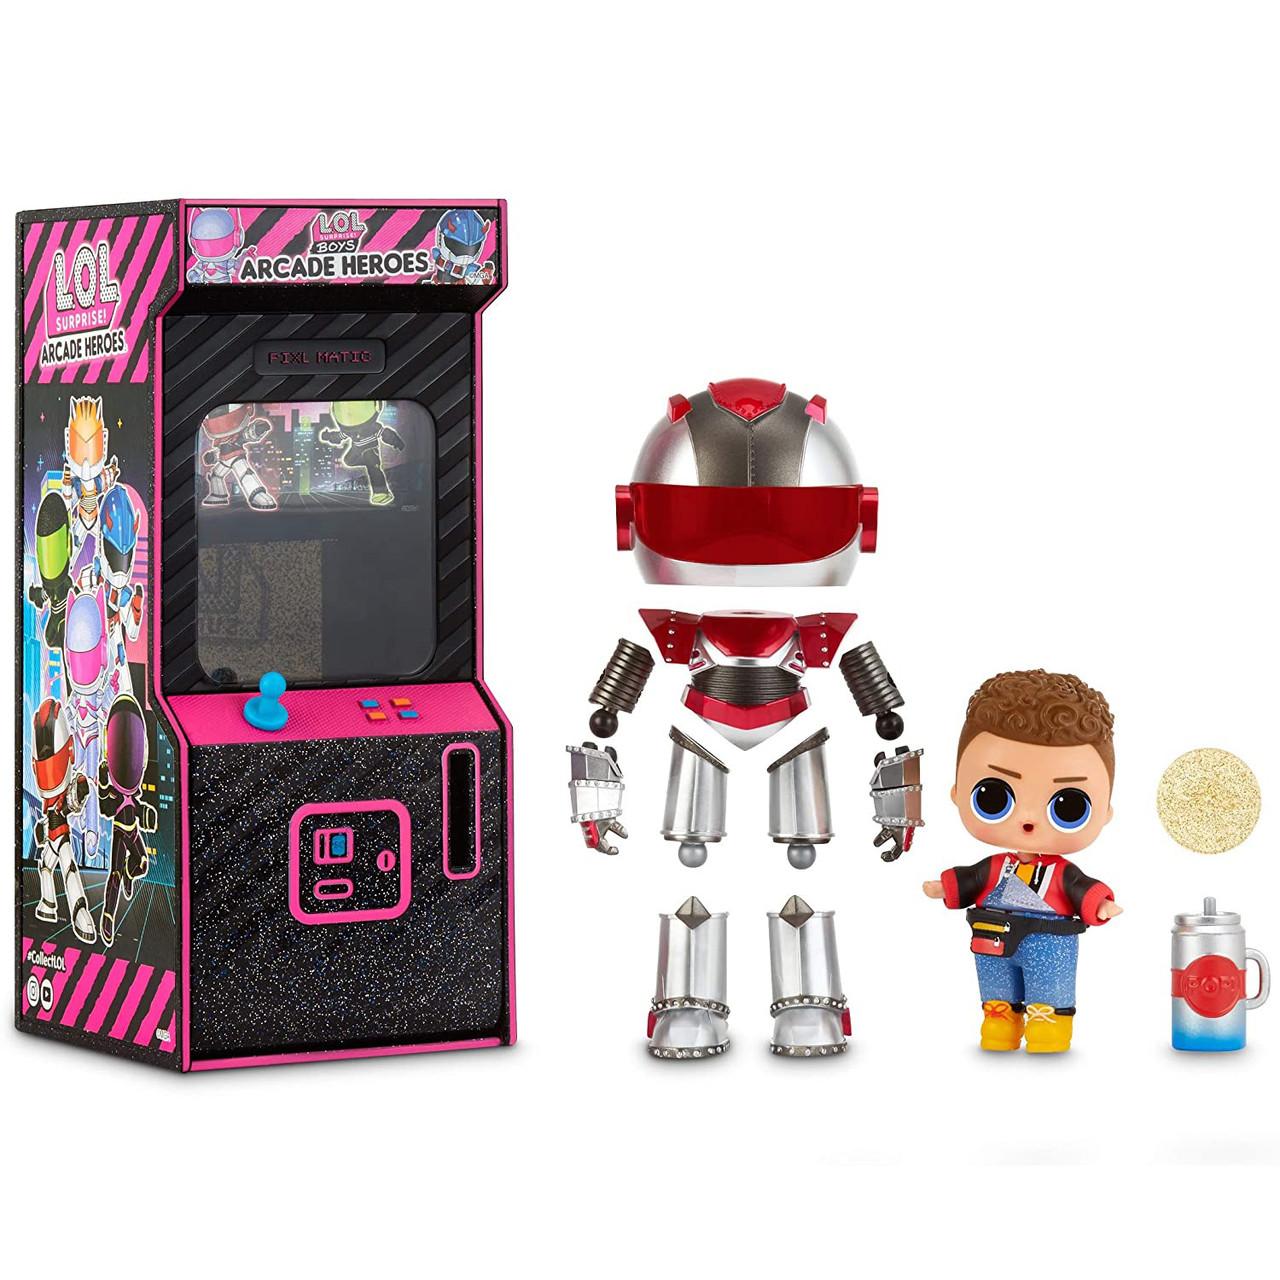 Лол Космонавты Герои аркады L.O.L. Surprise Boys Arcade HeroesКод: 569374